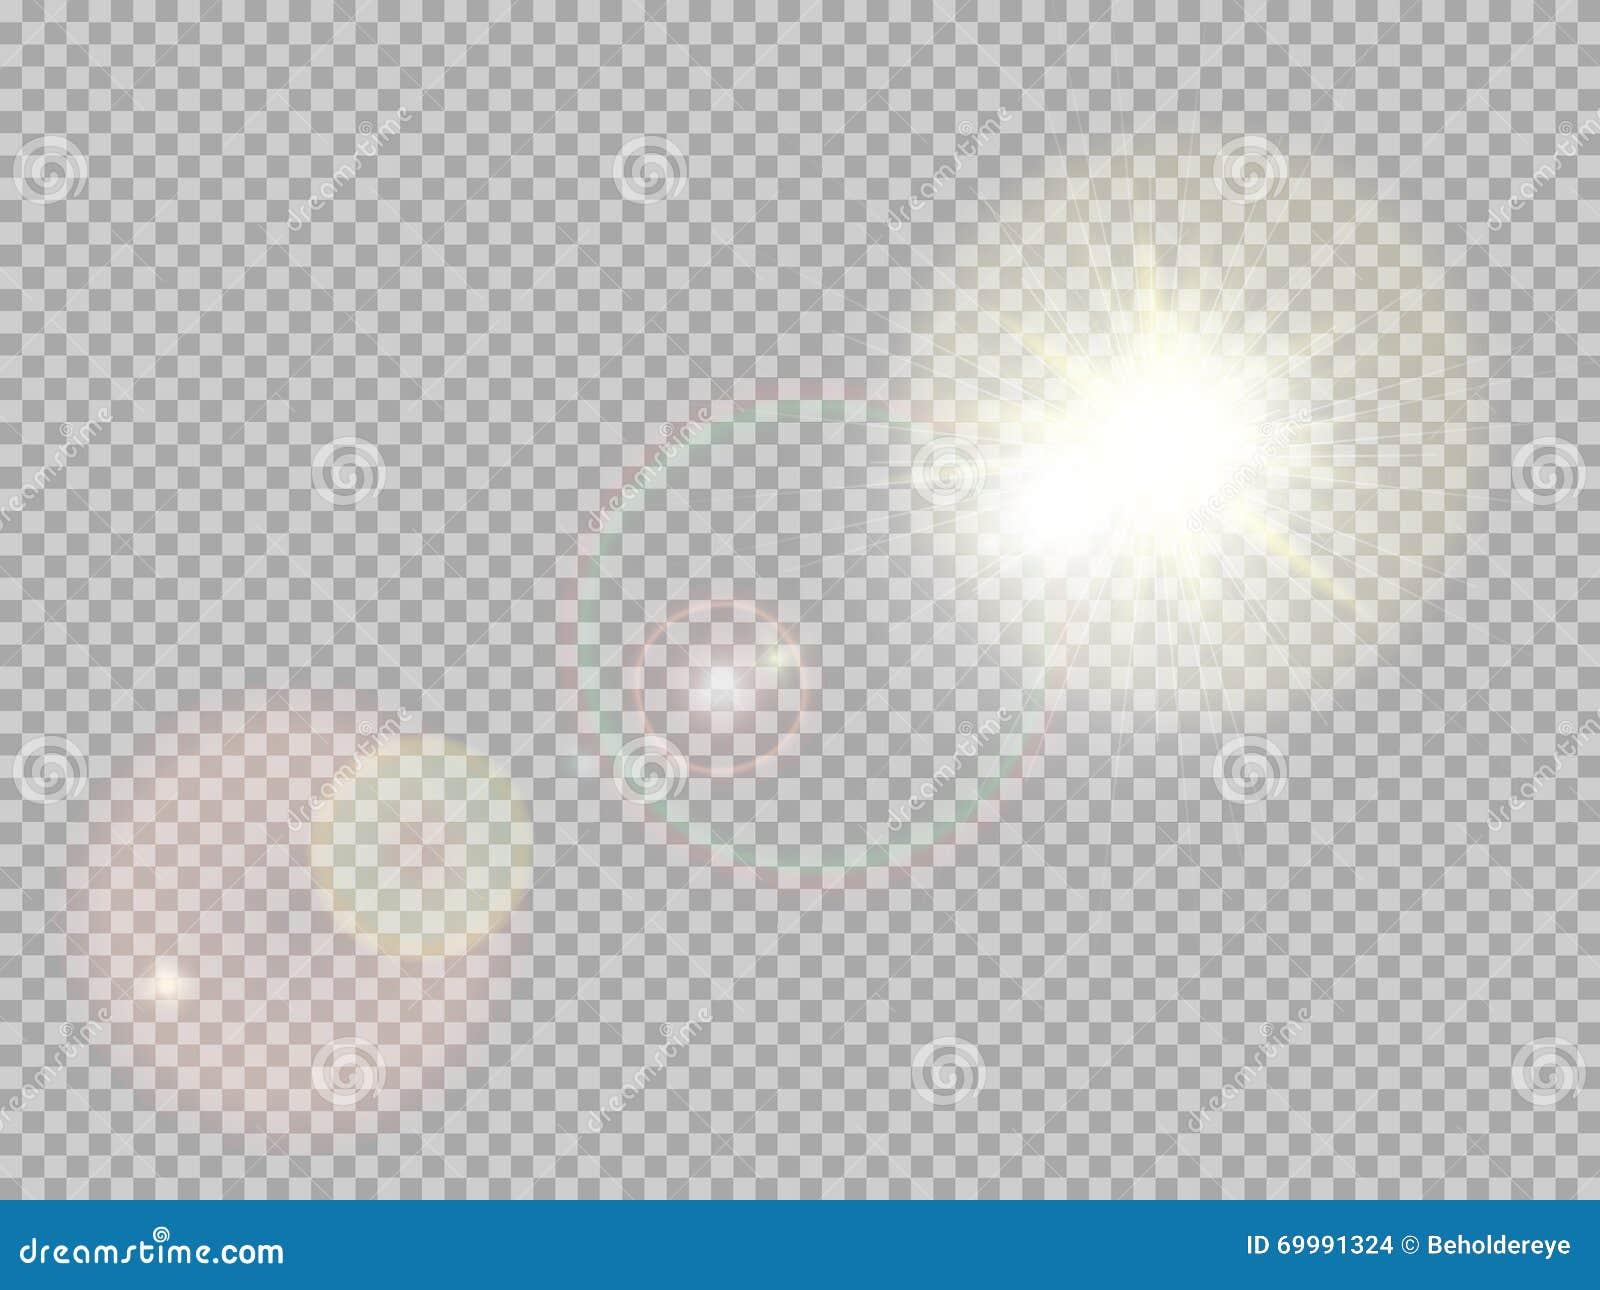 Sunlight special lens flare. EPS 10